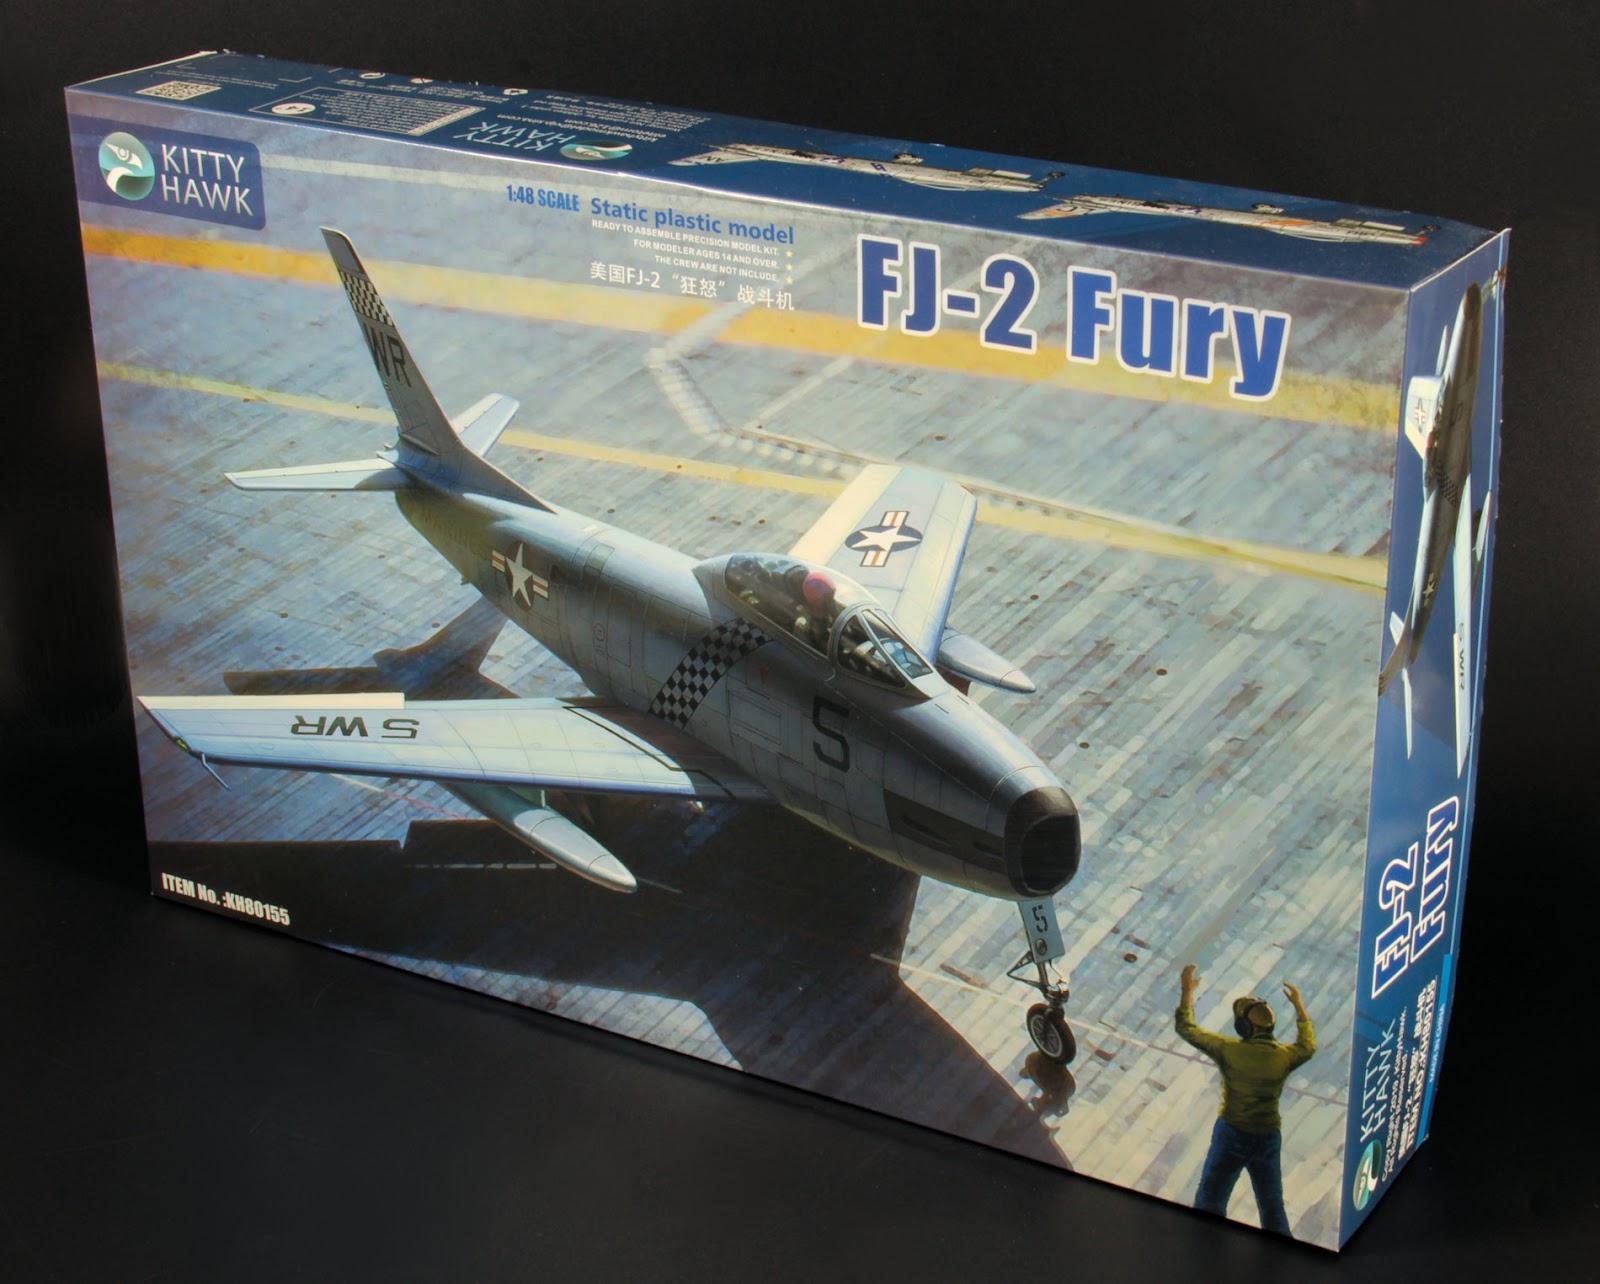 Kitty Hawk KH80156 1//48 Scale FJ-3 Fury Plastic Model Kit